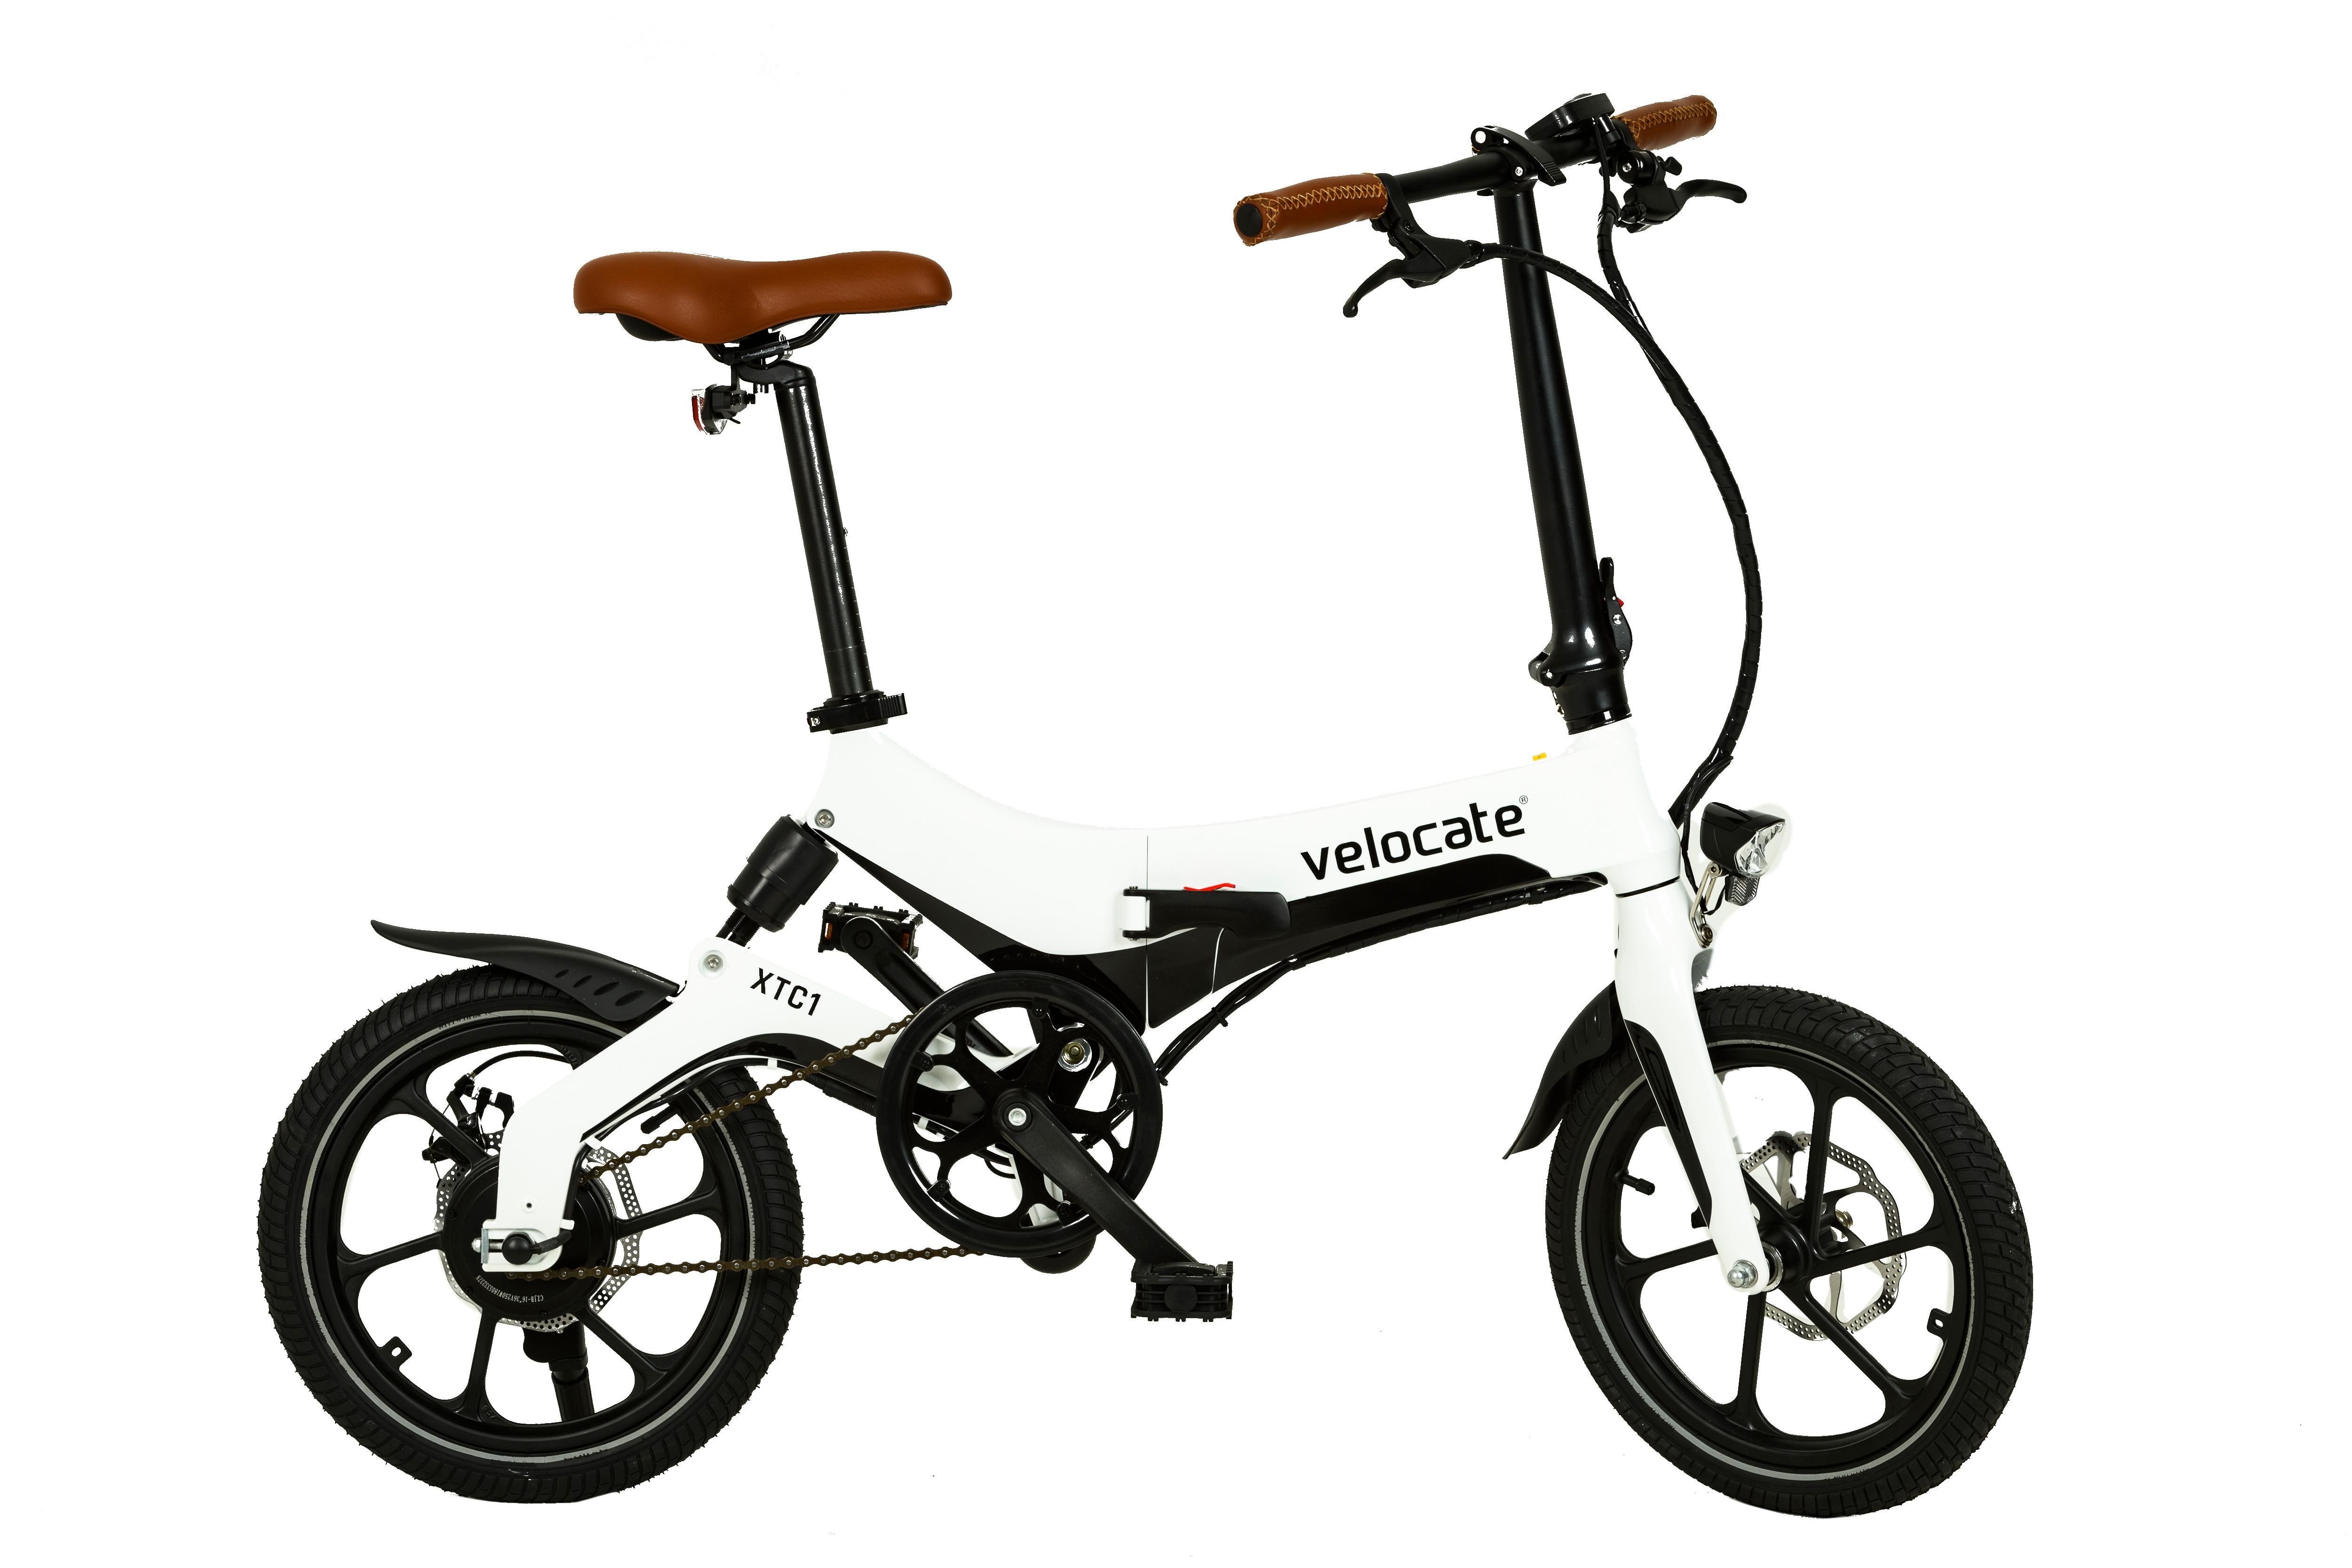 faltbares e bike velocate xtc1 wei e mobilit t xtasy. Black Bedroom Furniture Sets. Home Design Ideas